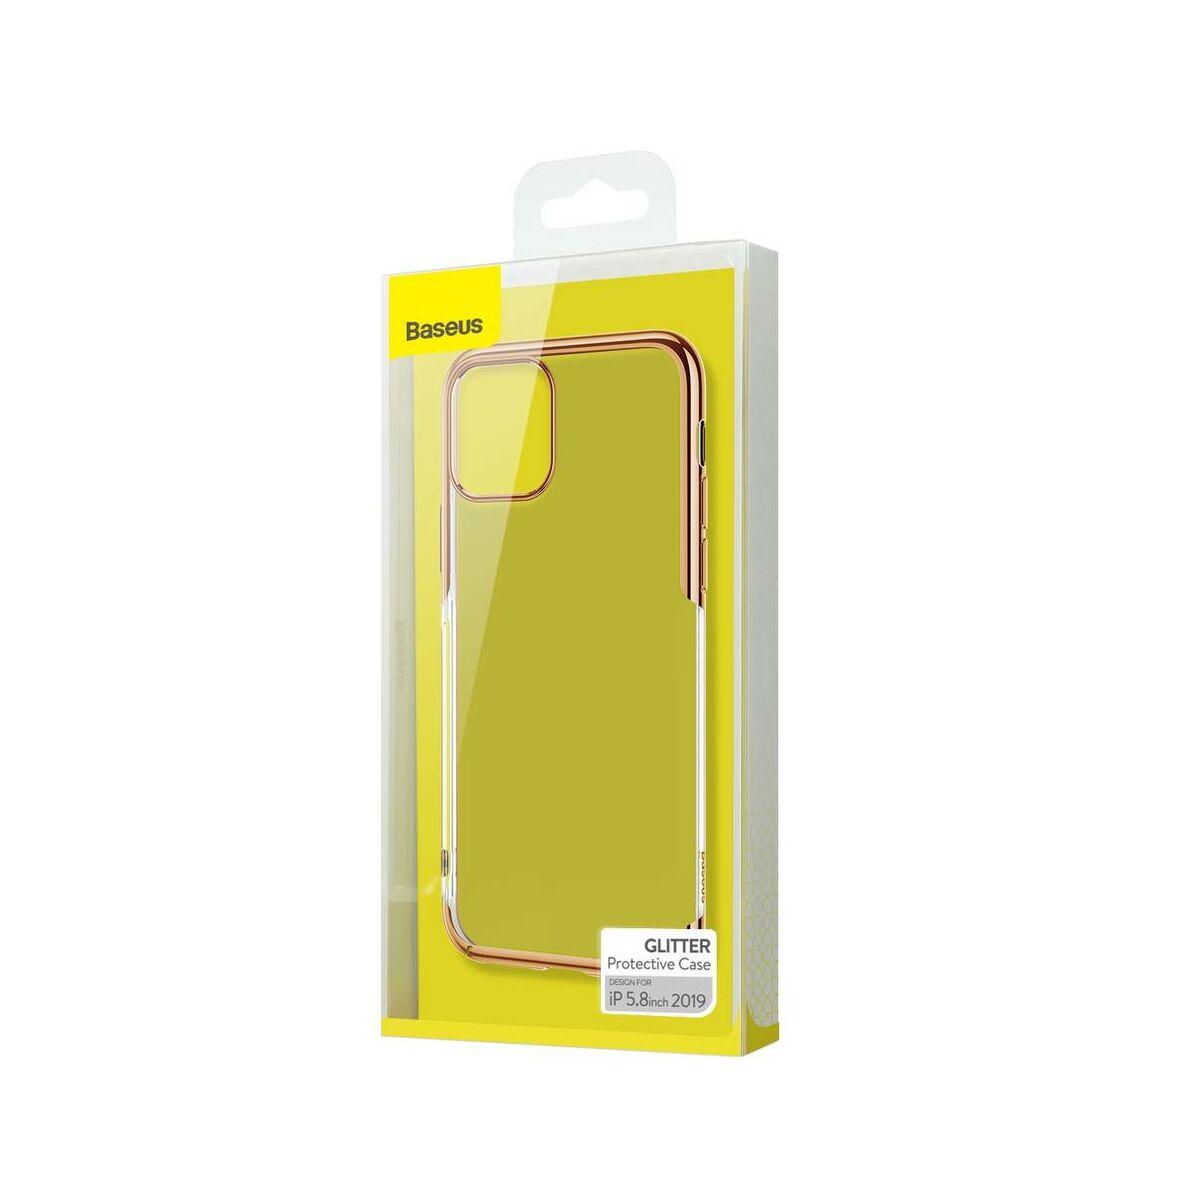 Baseus iPhone 11 Pro tok, Glitter, arany (WIAPIPH58S-DW0V)